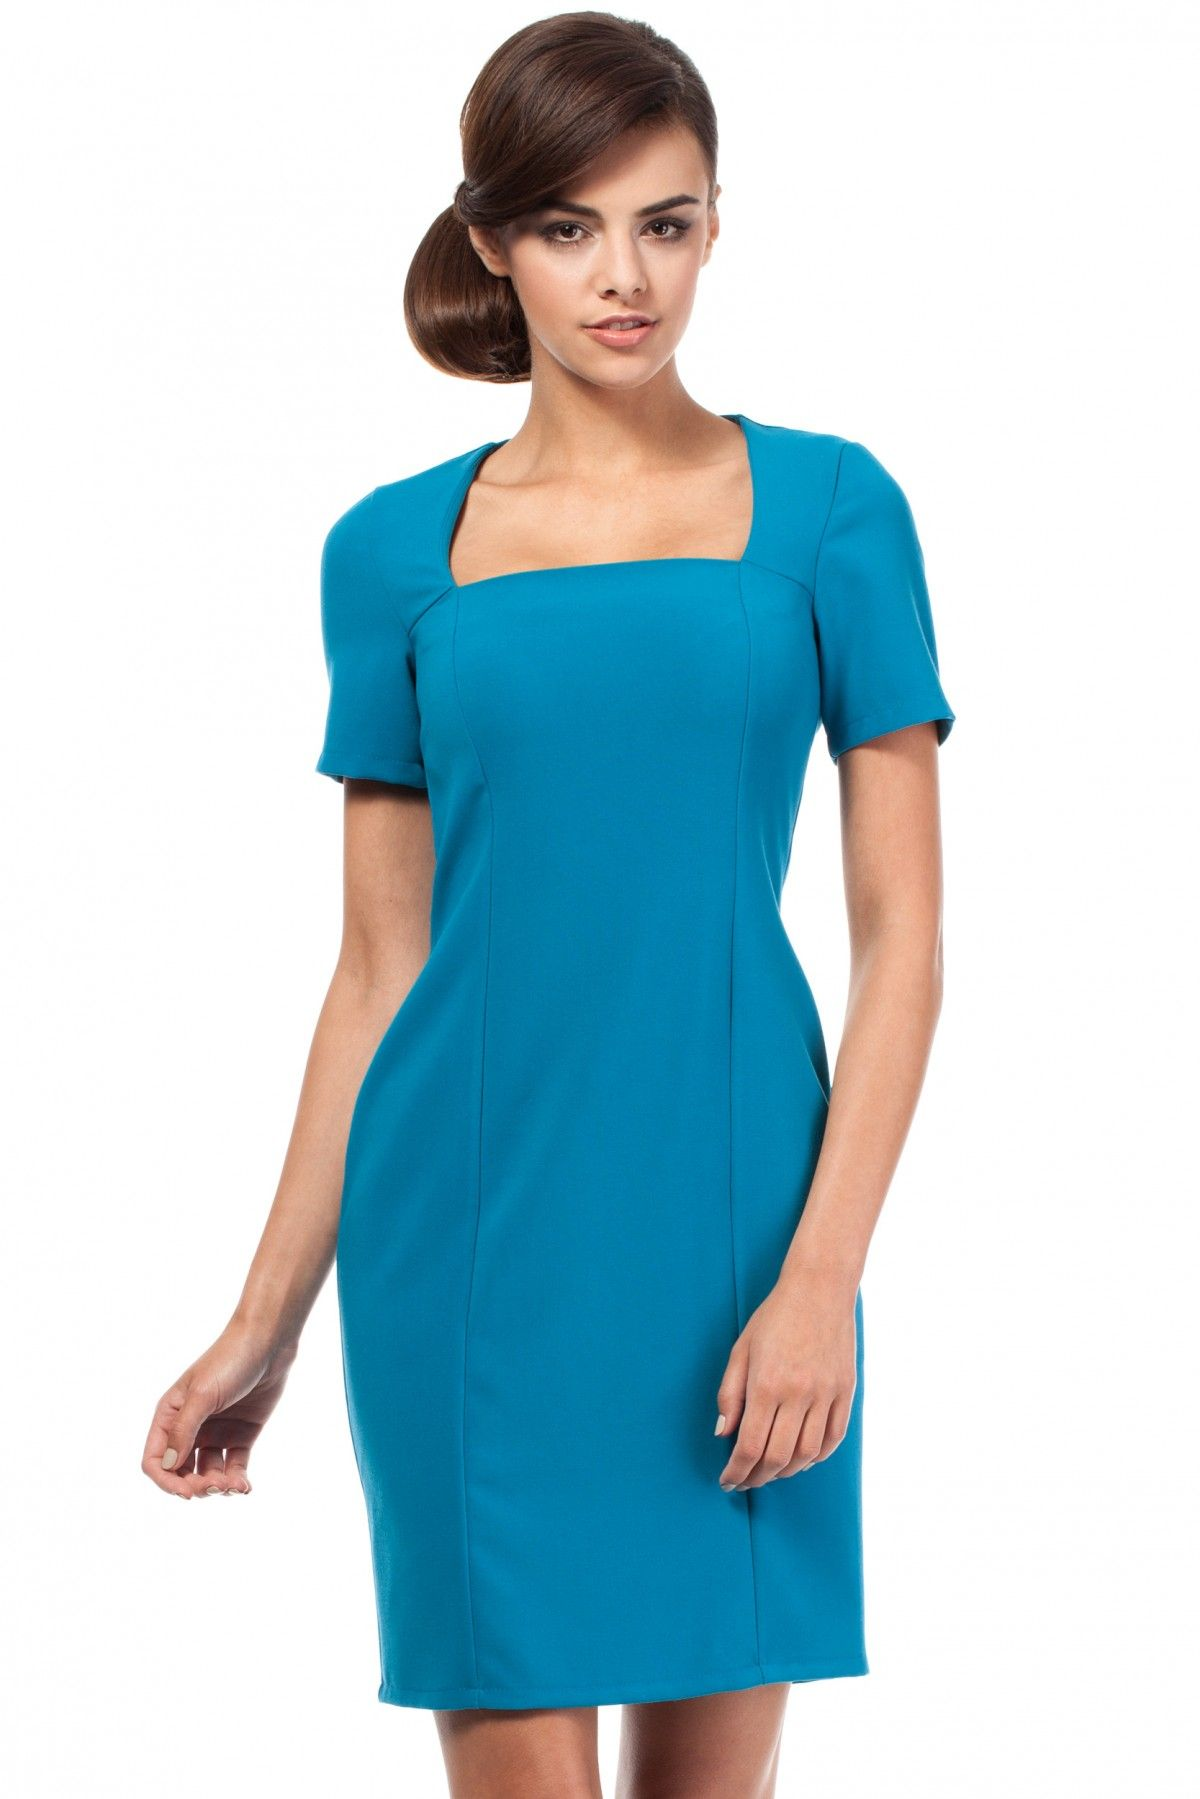 62849e415d Elegancka Dopasowana Ołówkowa Sukienka dekolt KARO - 7354565859 ...